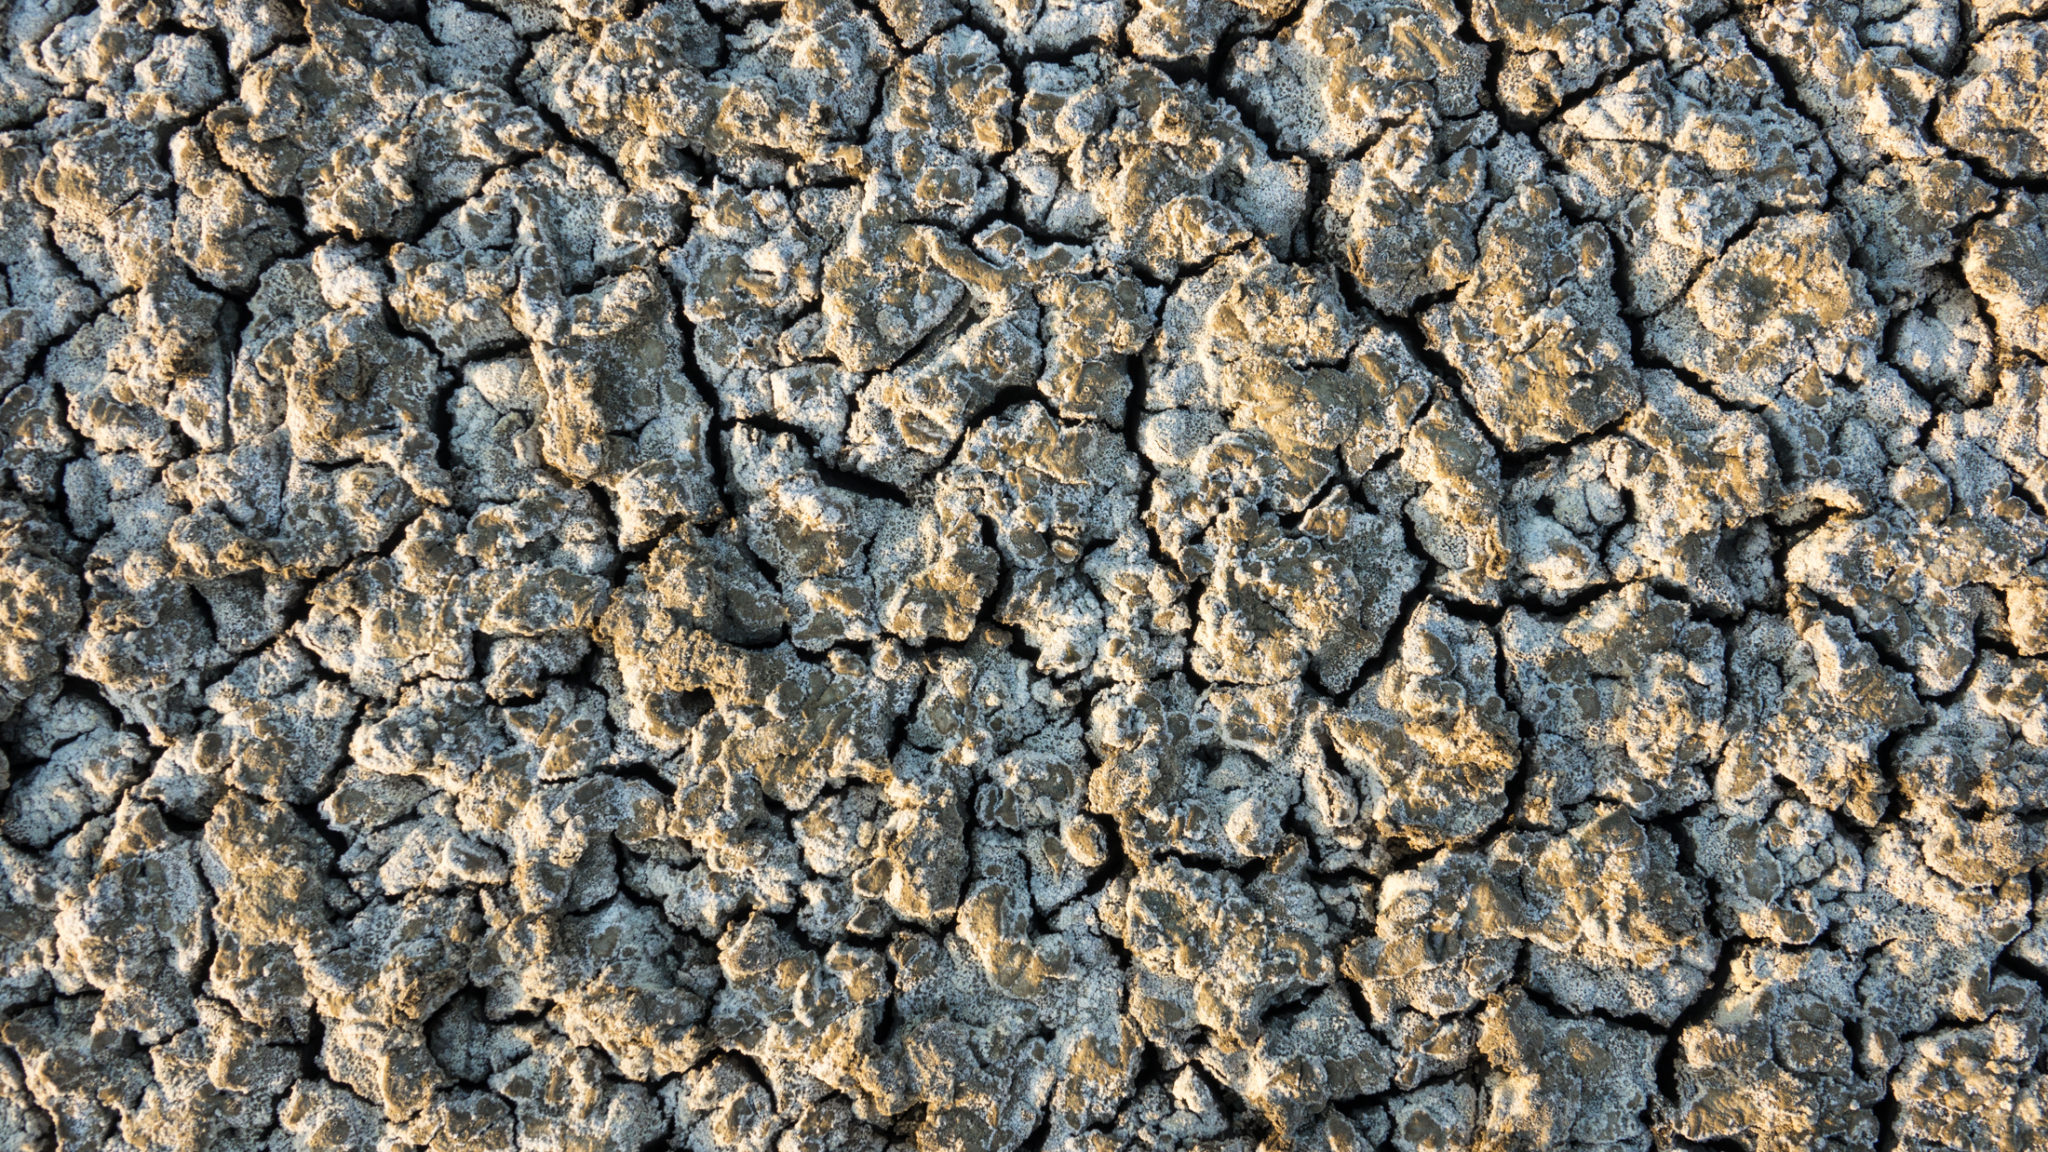 Ausgetrockneter Boden am Lake Manyara, Tansania